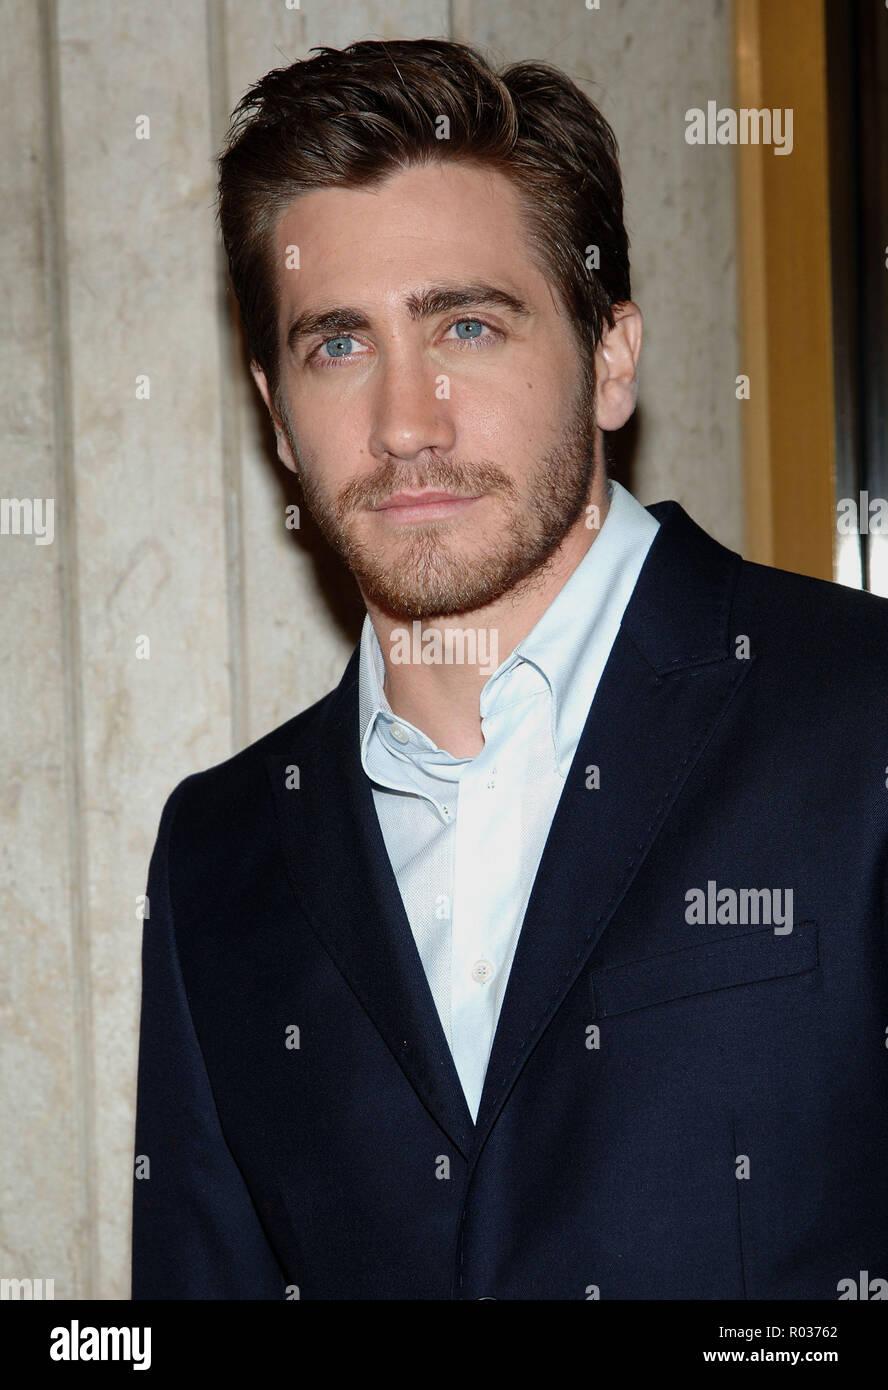 Jake Gyllenhaal 2005 Stock Photos Jake Gyllenhaal 2005 Stock